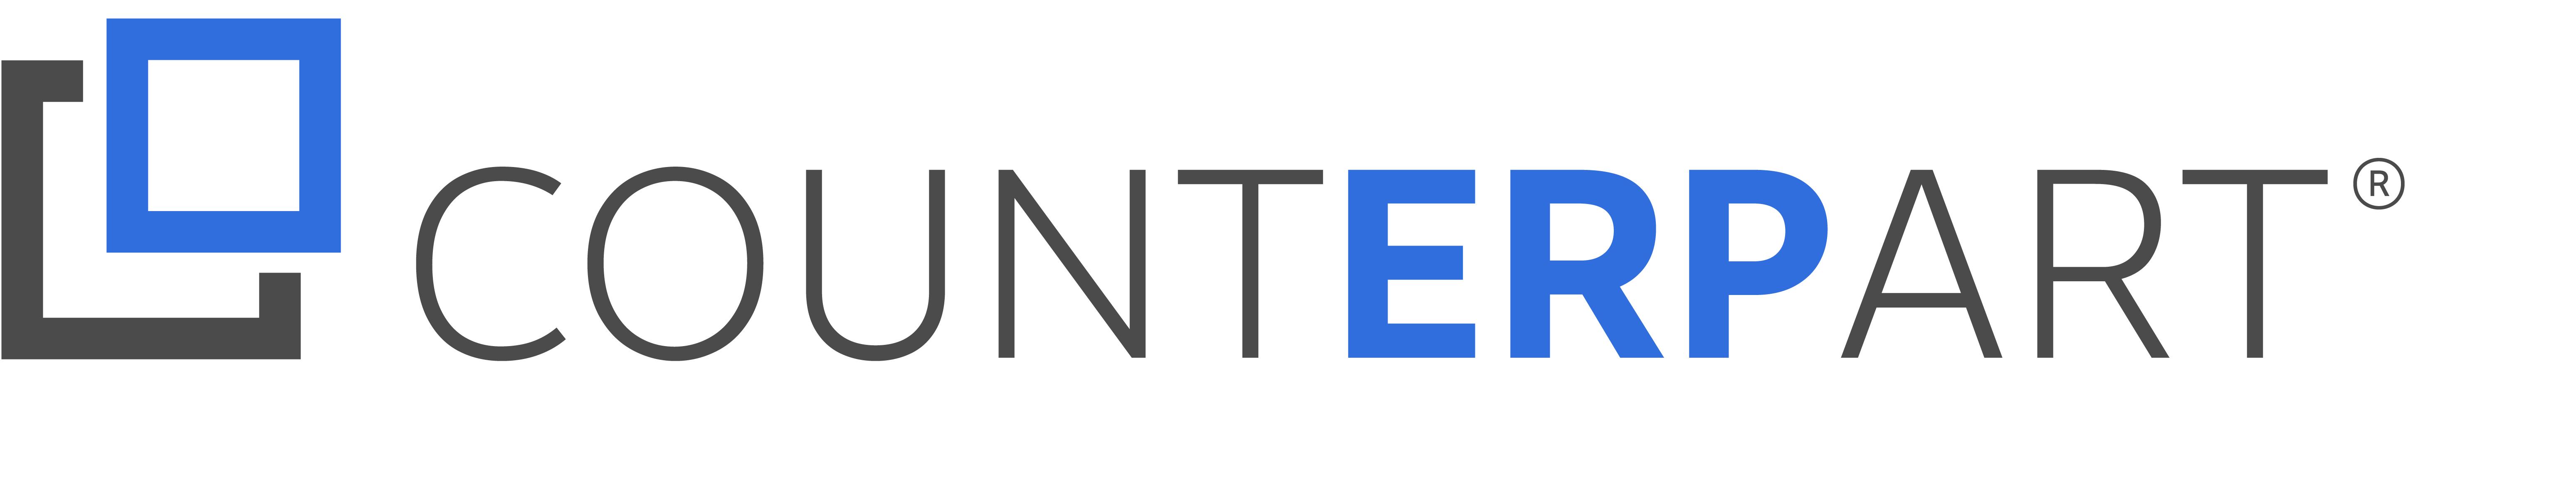 Cutting Tool Engineering Magazine Looks at ETO ERP COUNTERPART